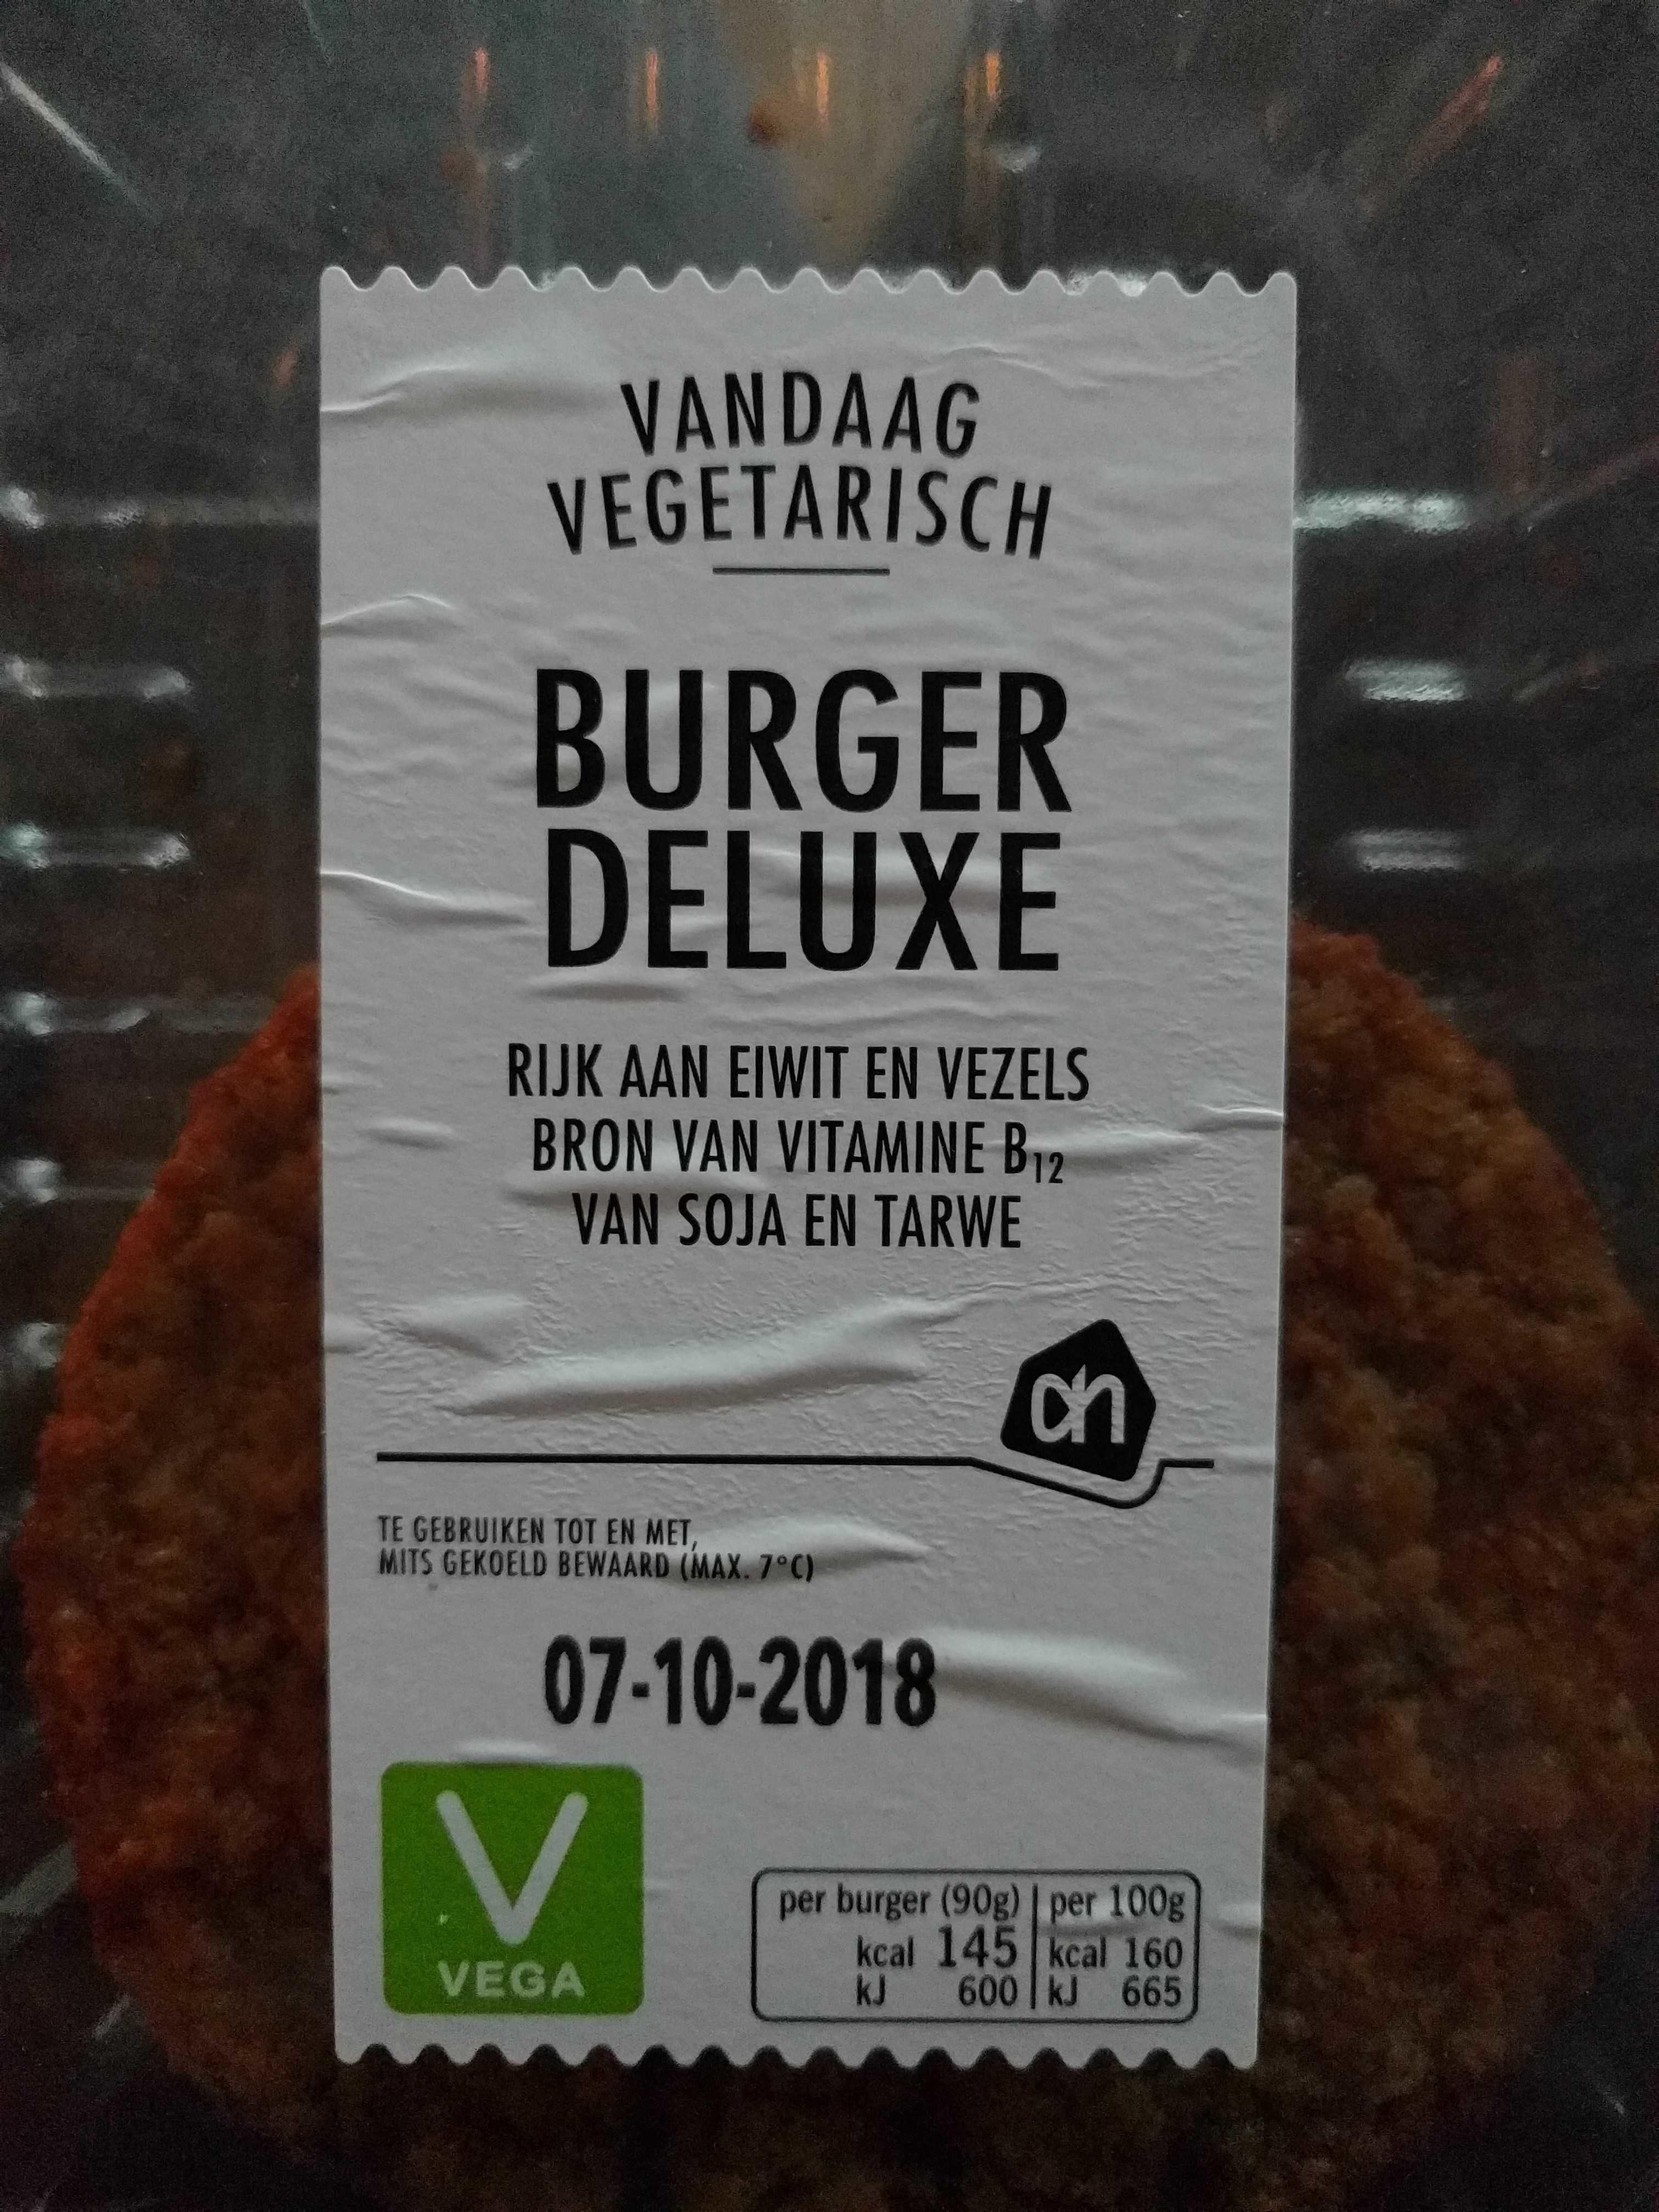 Burger deluxe vega - Producto